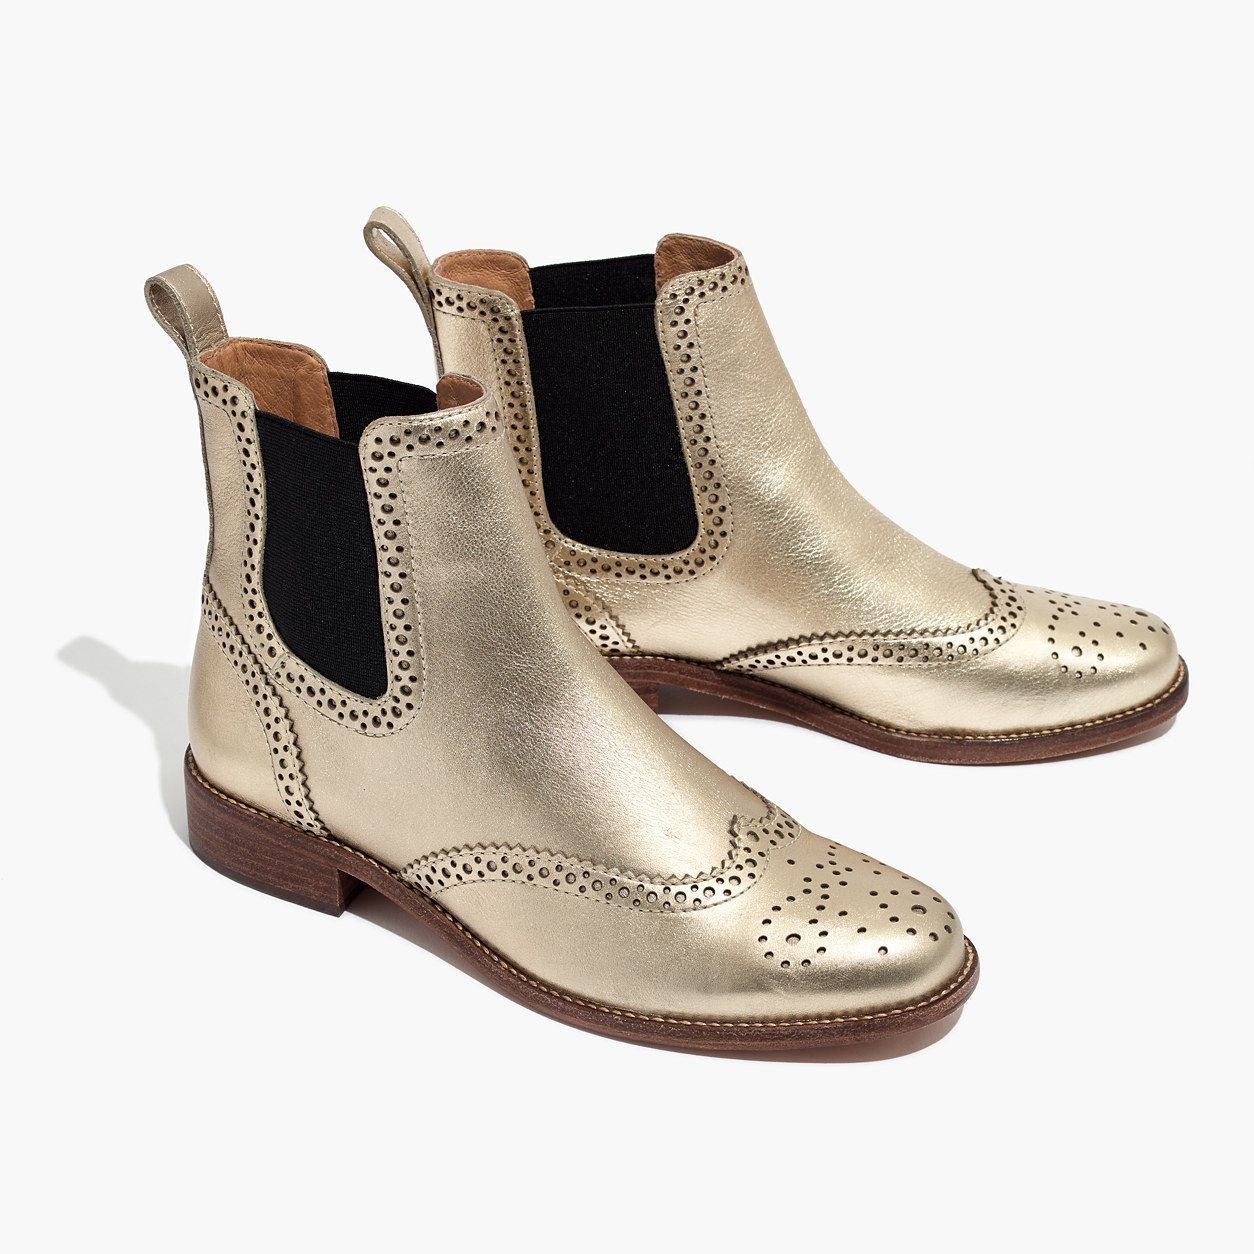 Madewell Womens Ivan Brogue Chelsea Boot In Metallic Brogue Chelsea Boots Boots Metallic Ankle Boots